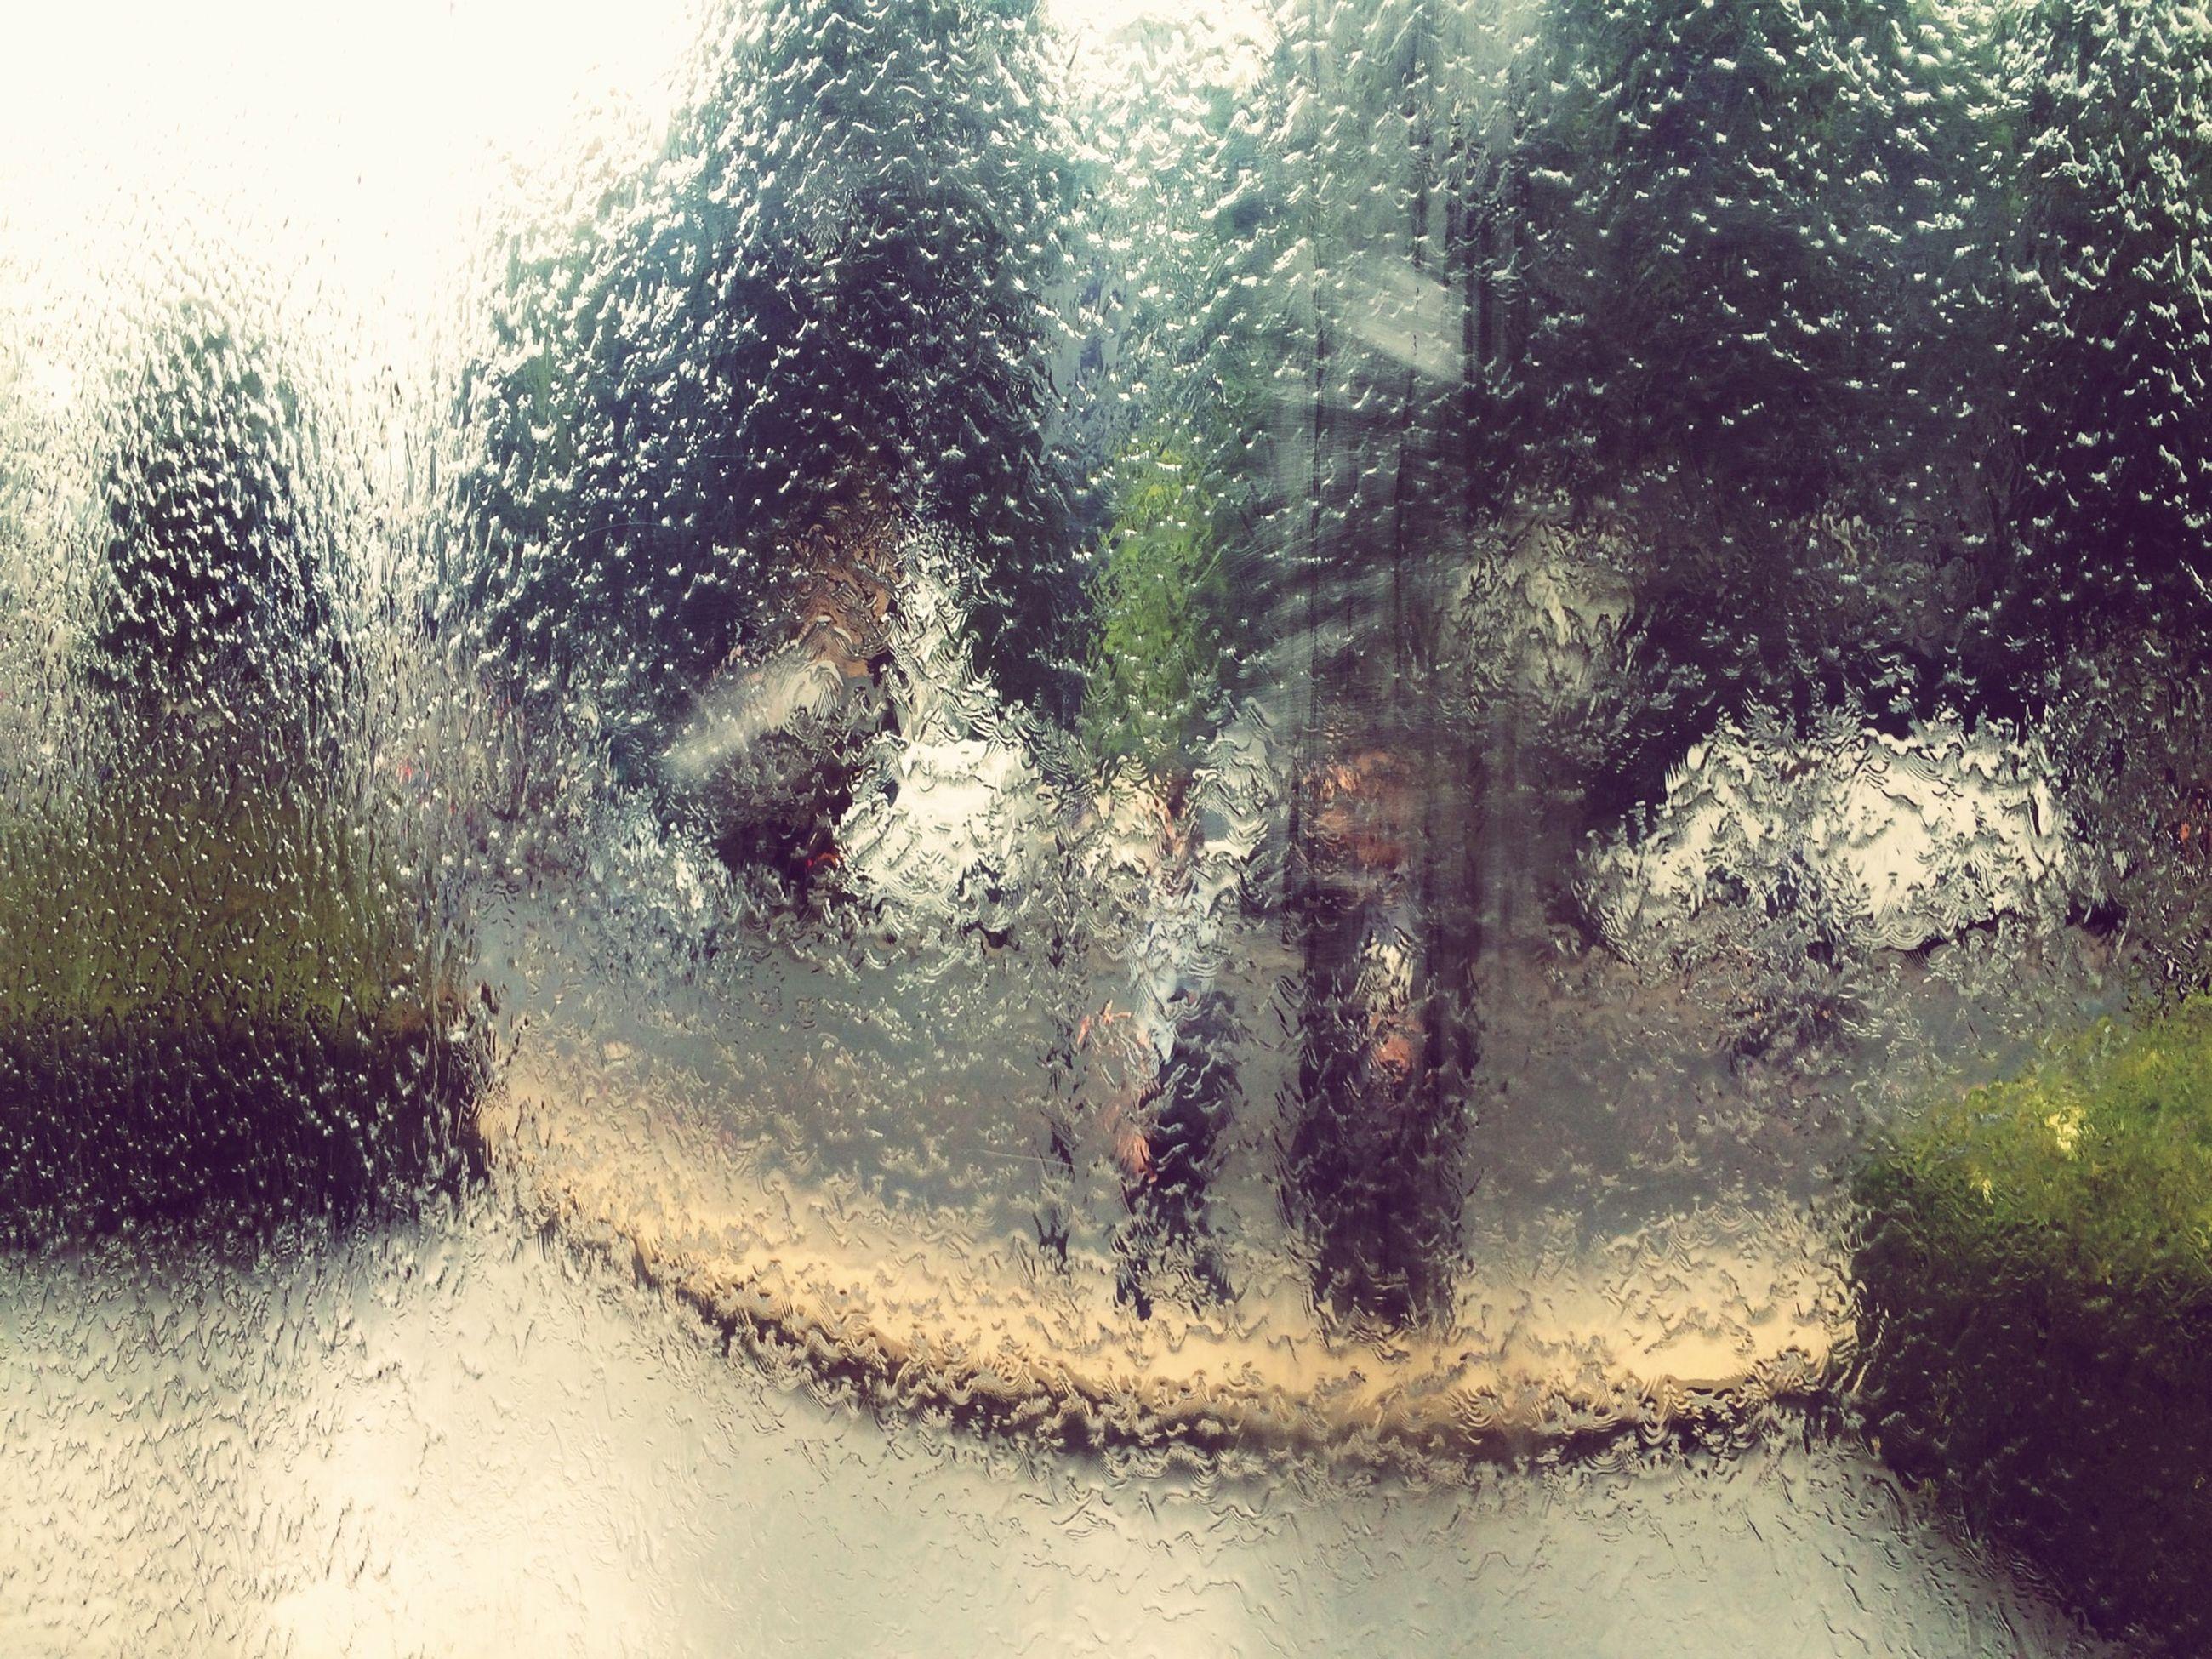 water, wet, drop, transparent, rain, window, glass - material, season, weather, reflection, puddle, raindrop, monsoon, full frame, street, rainy season, high angle view, close-up, nature, day